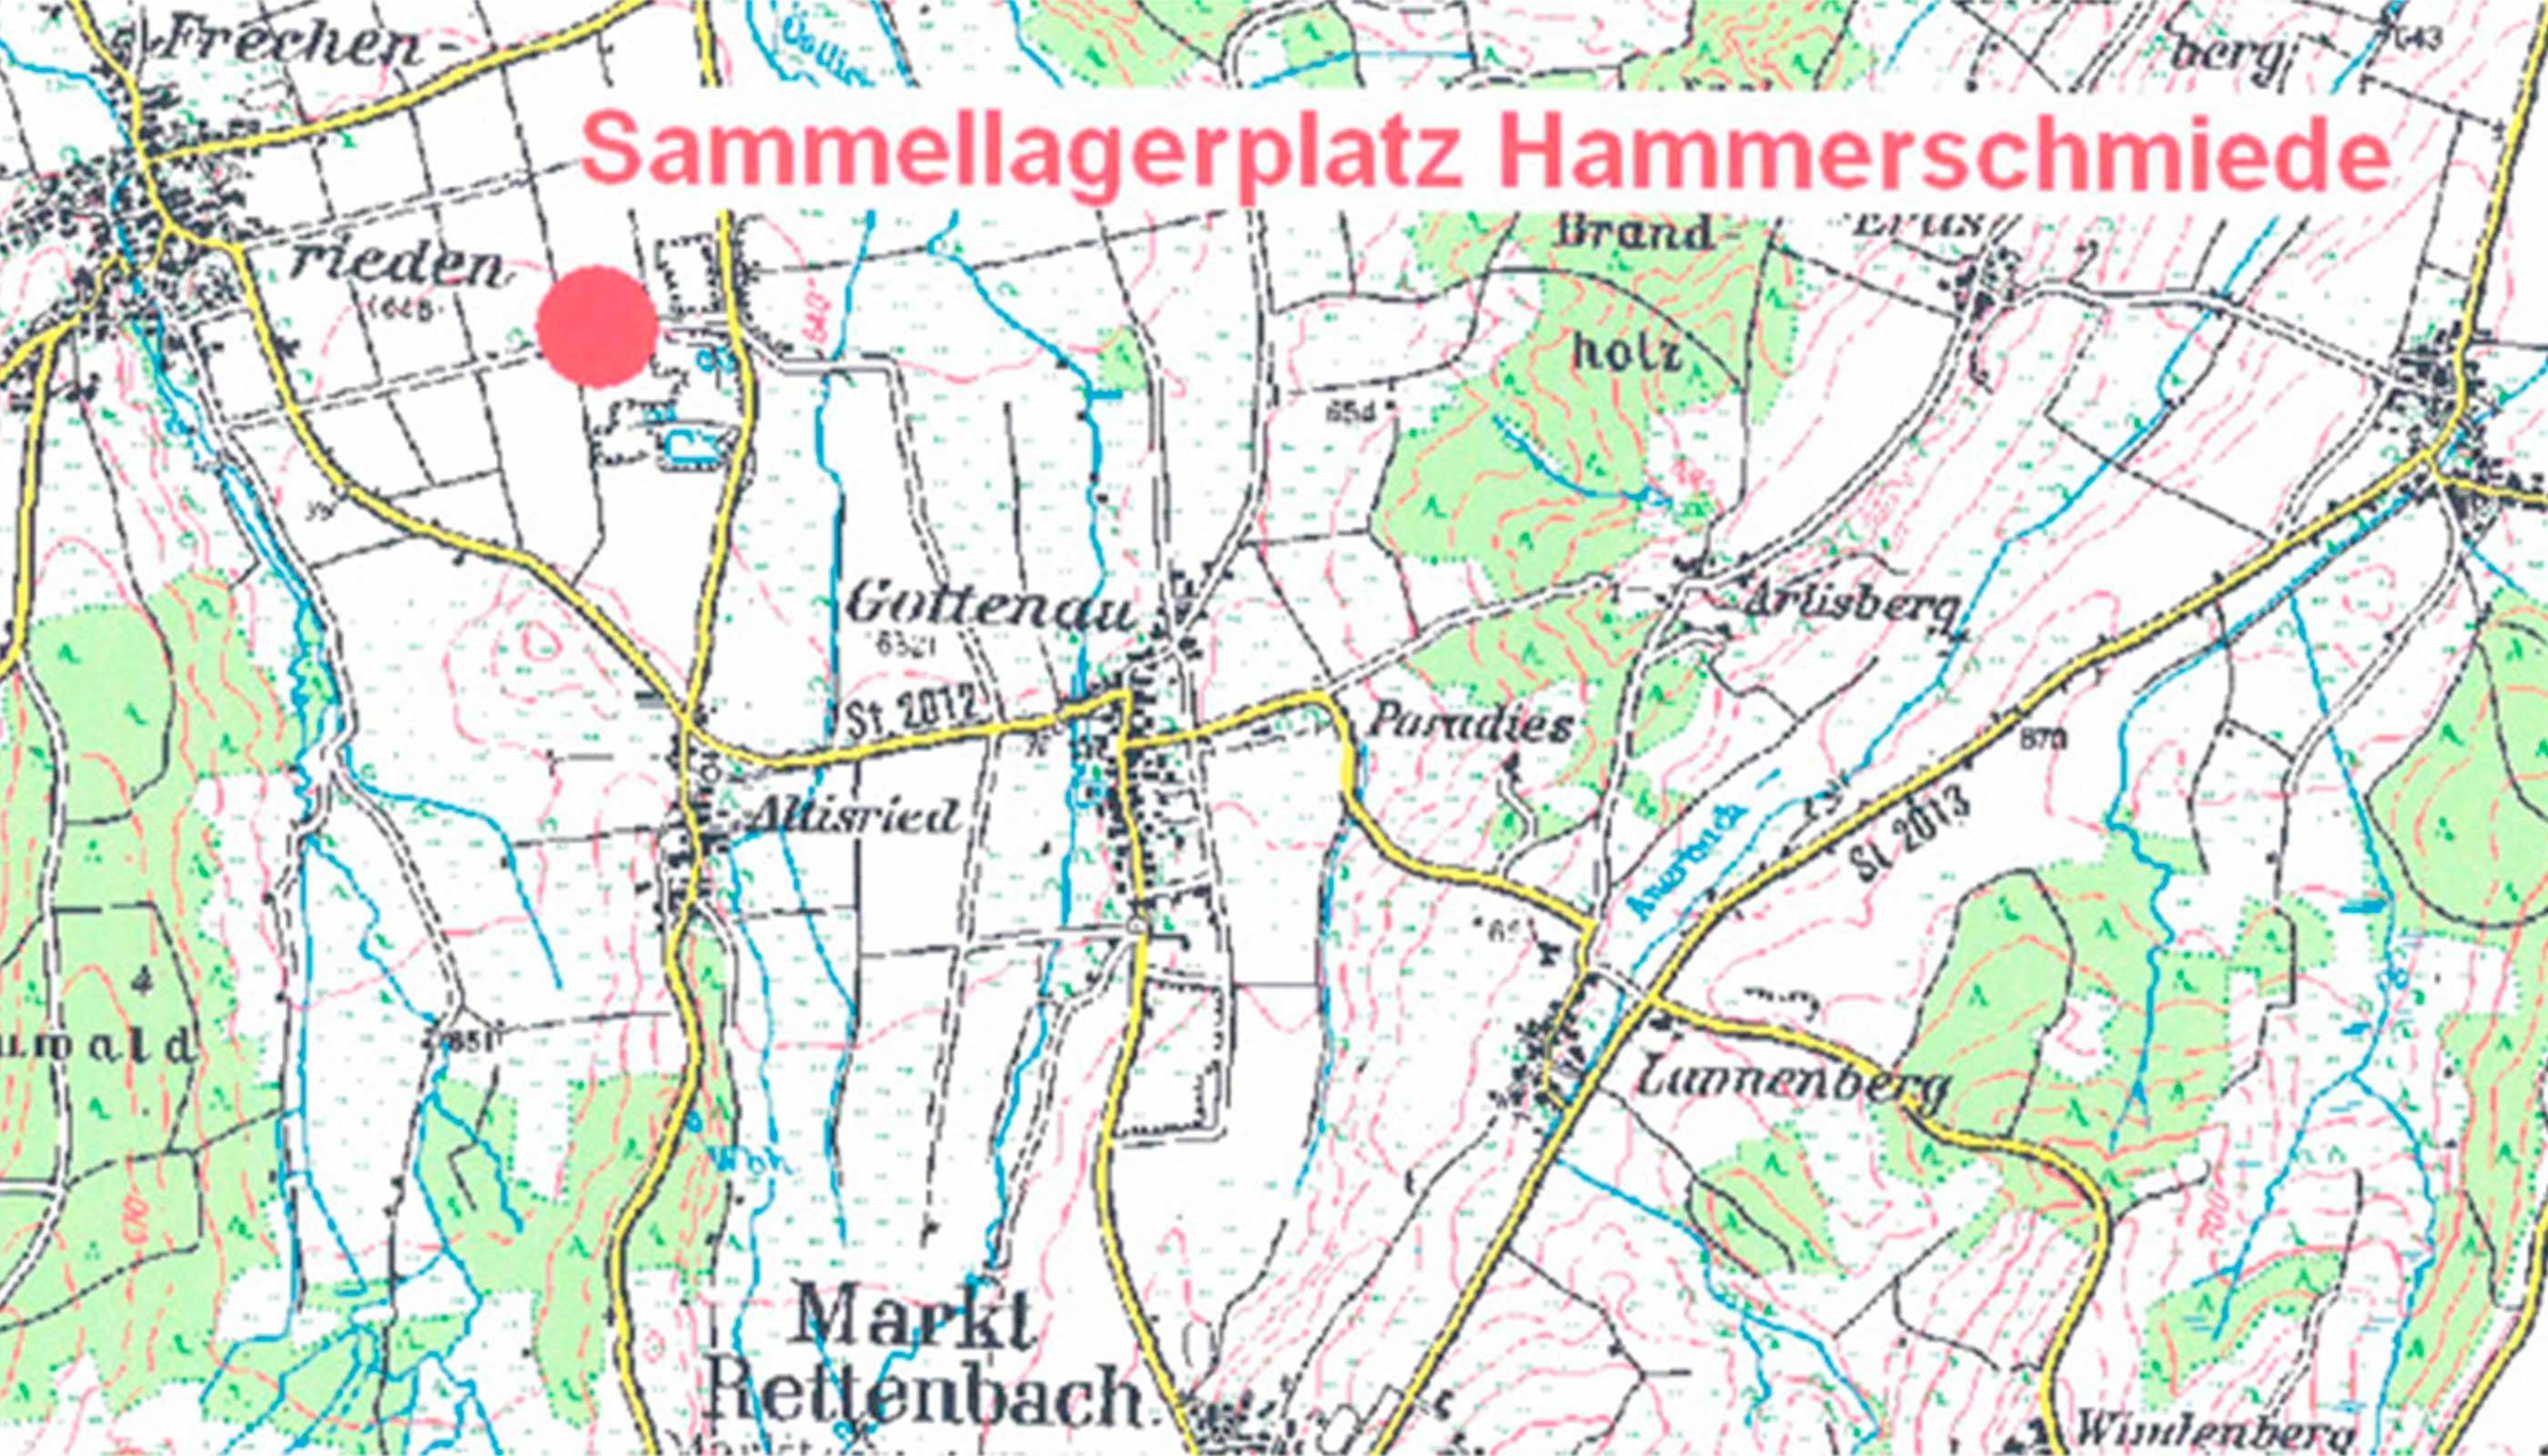 Sammellagerplatz Hammerschmiede